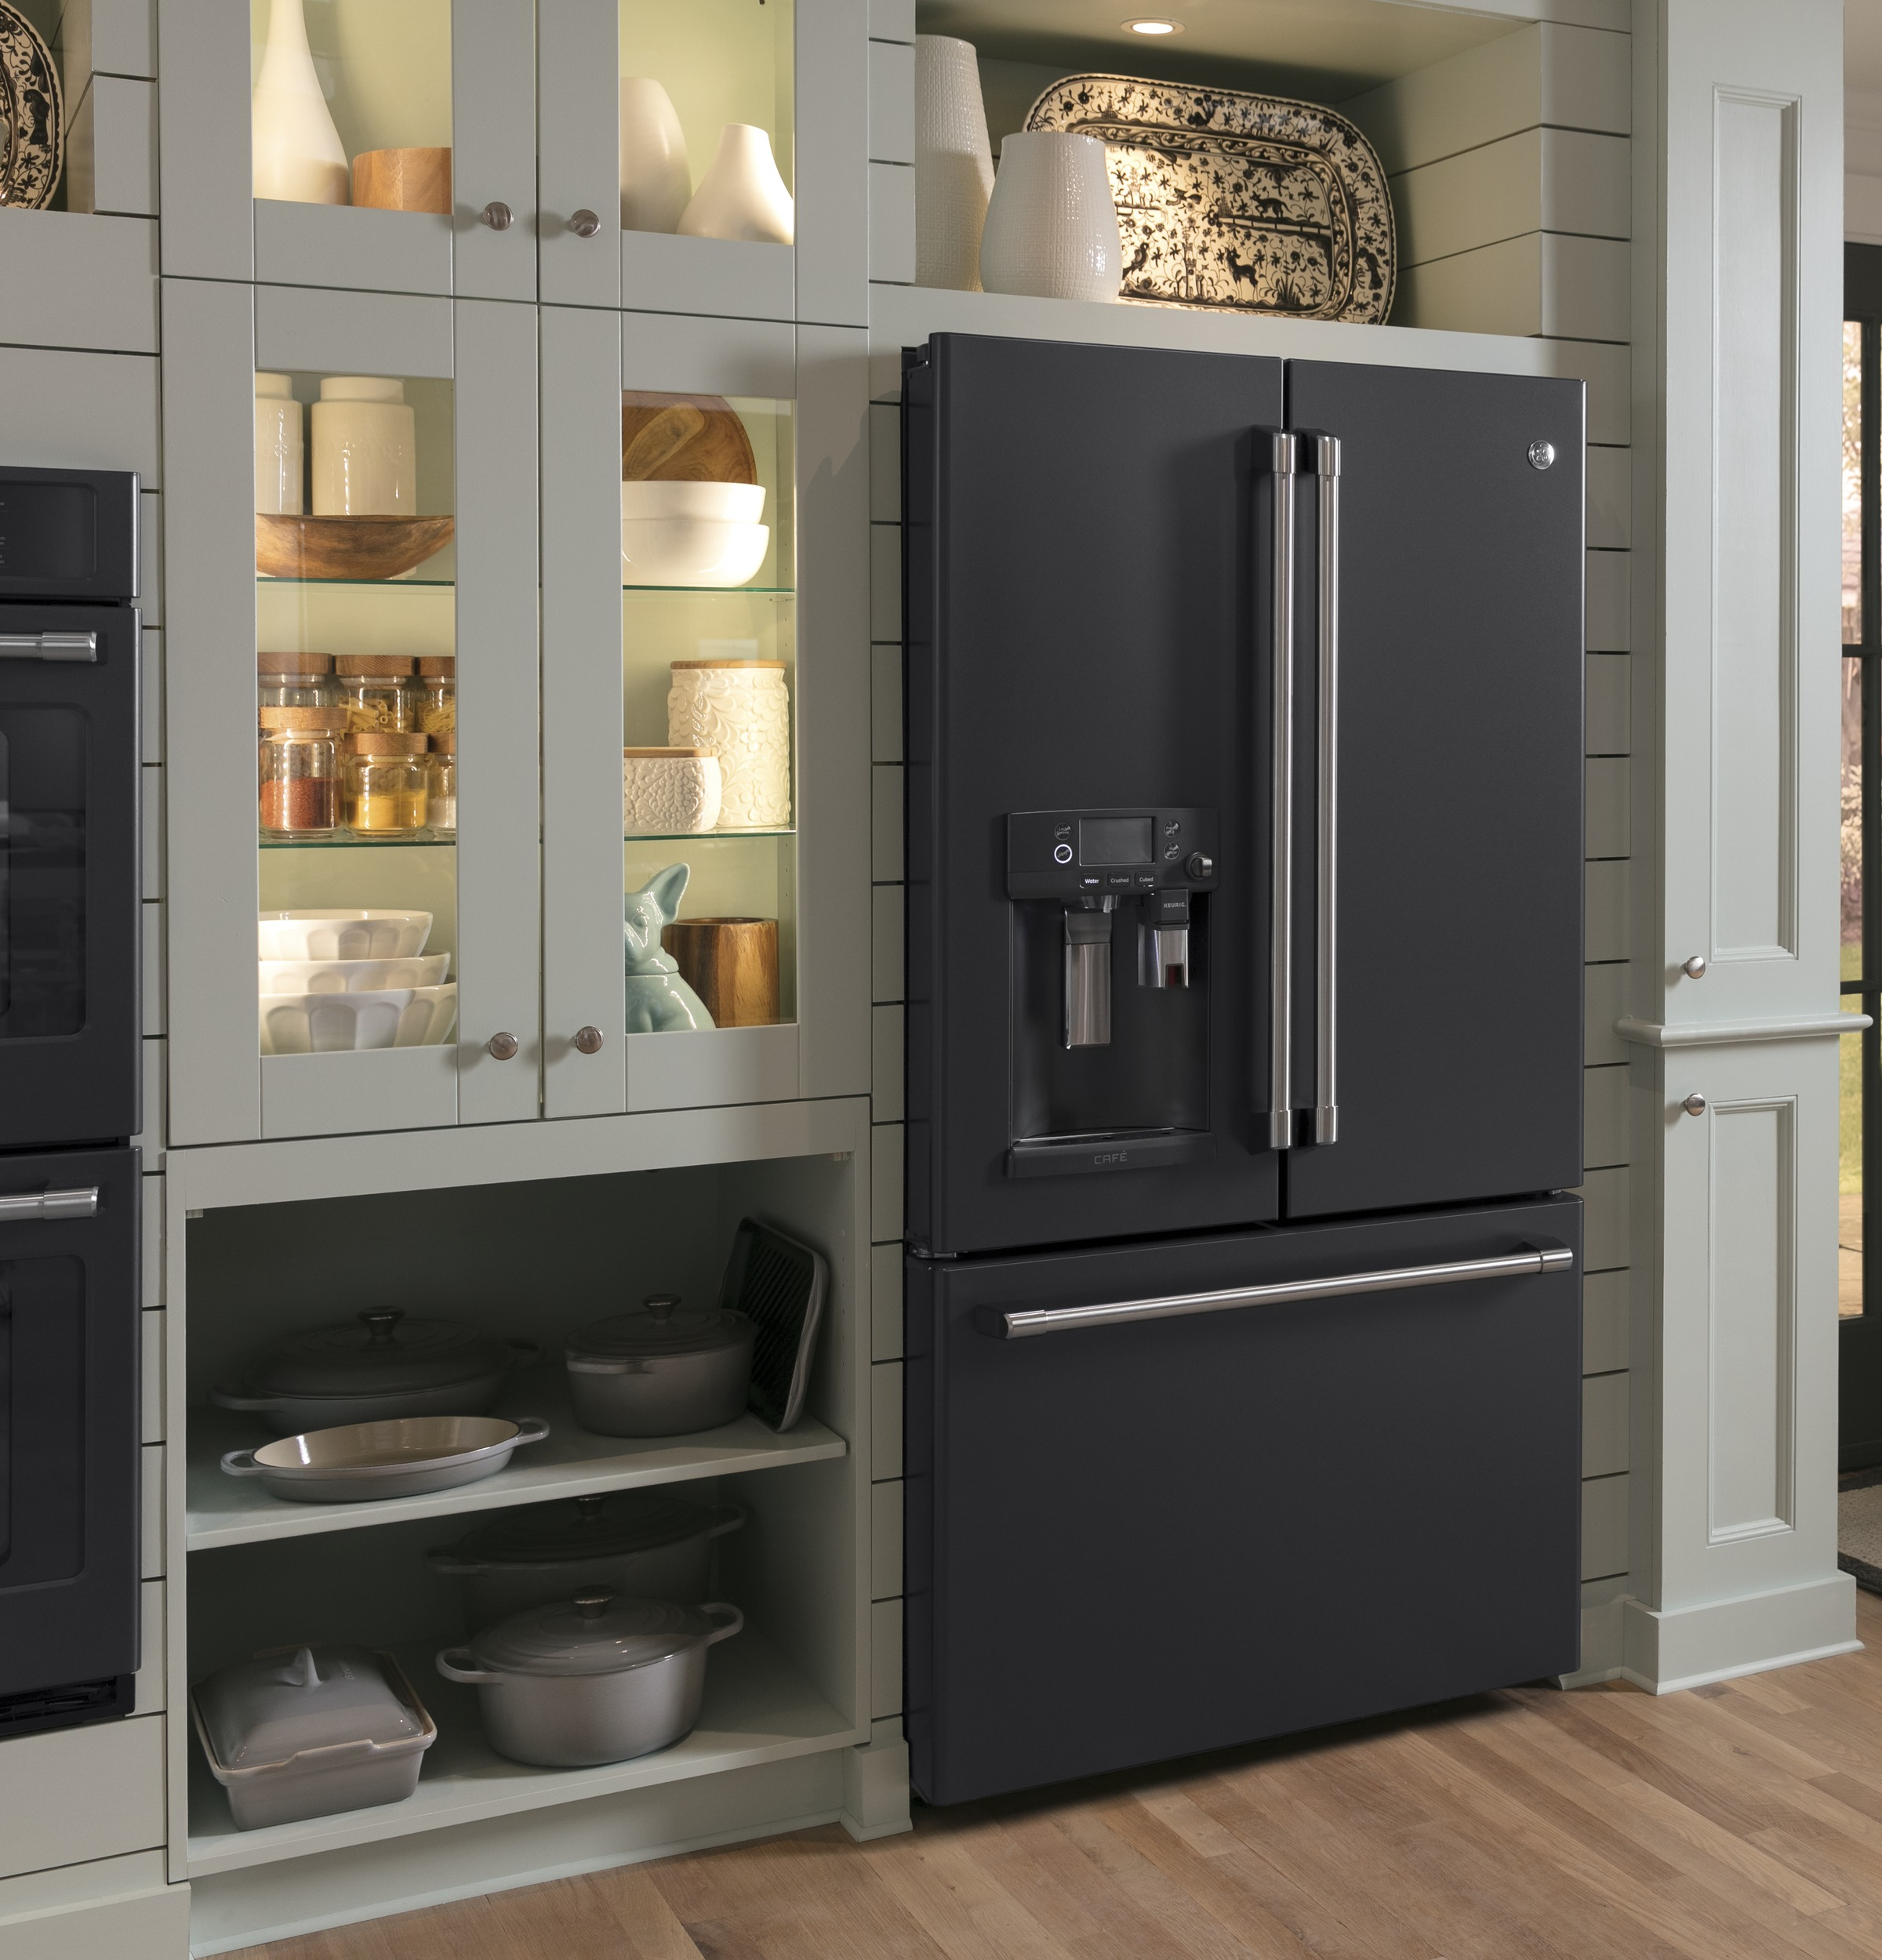 Tax Free Refrigerators Are Coming Kitchen Design Blog